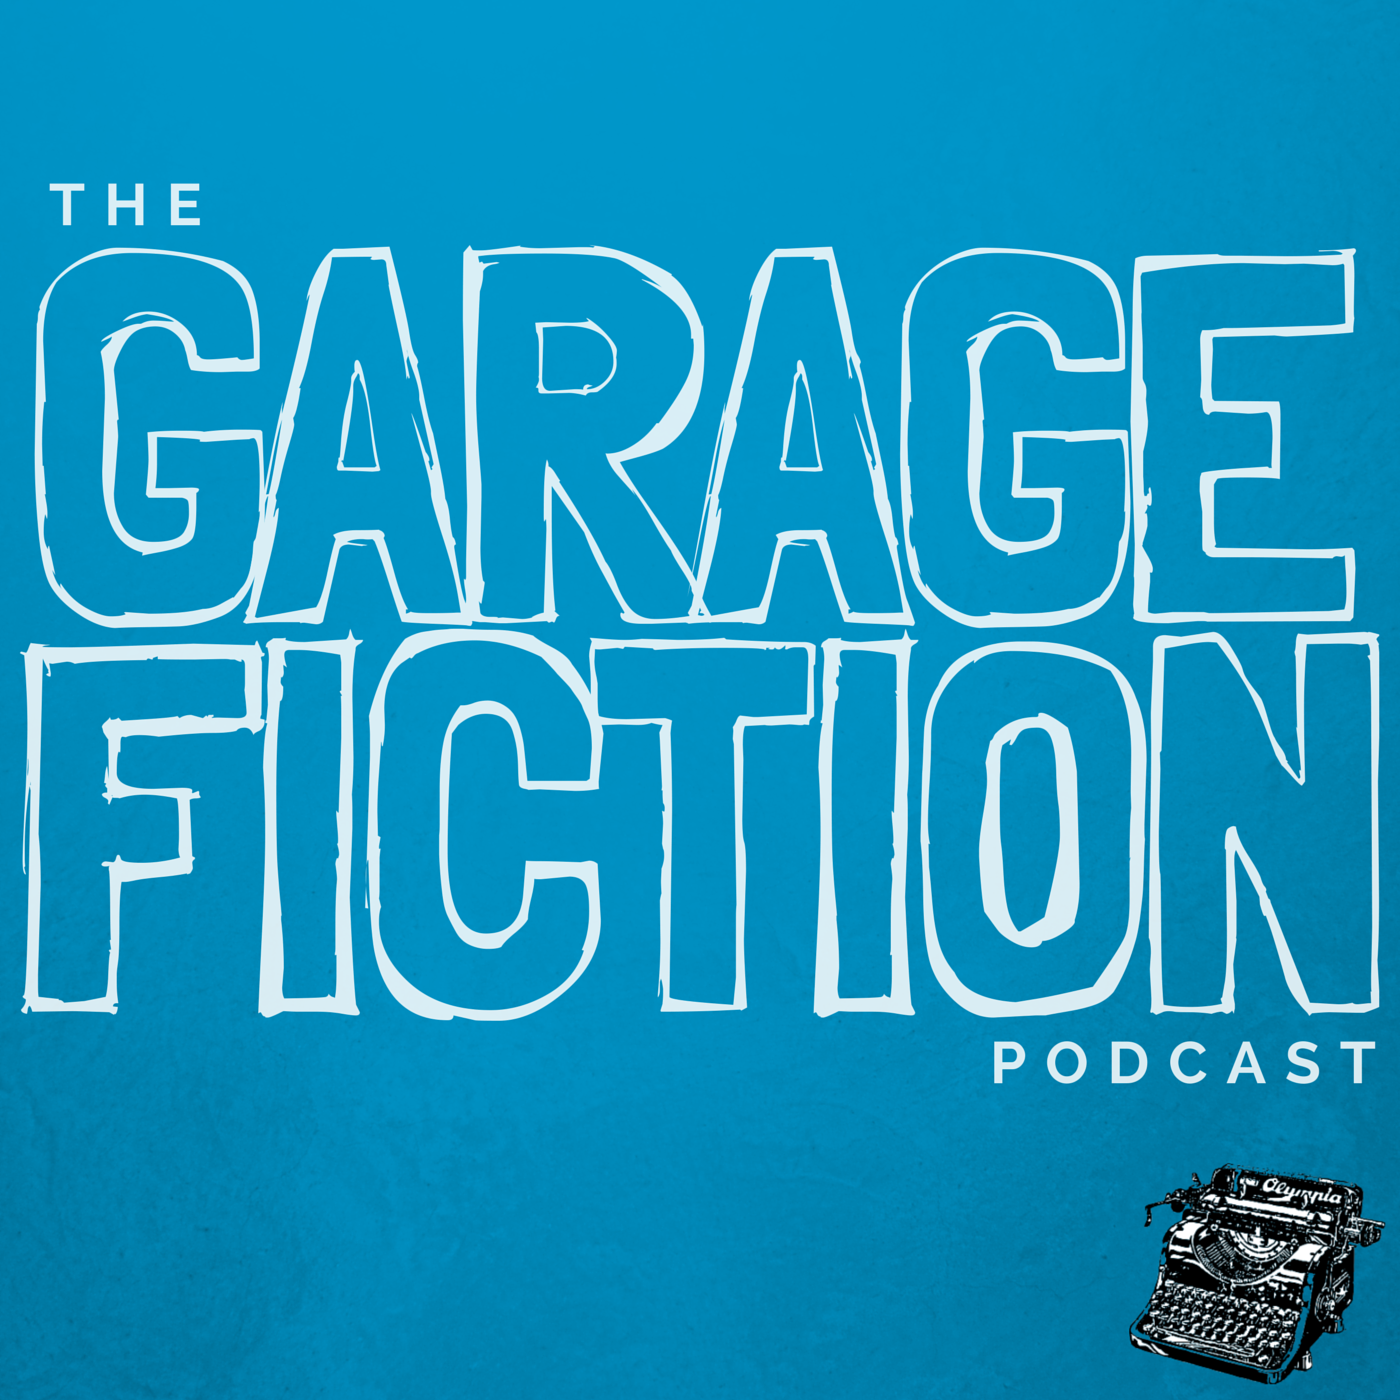 Garage Fiction Podcast